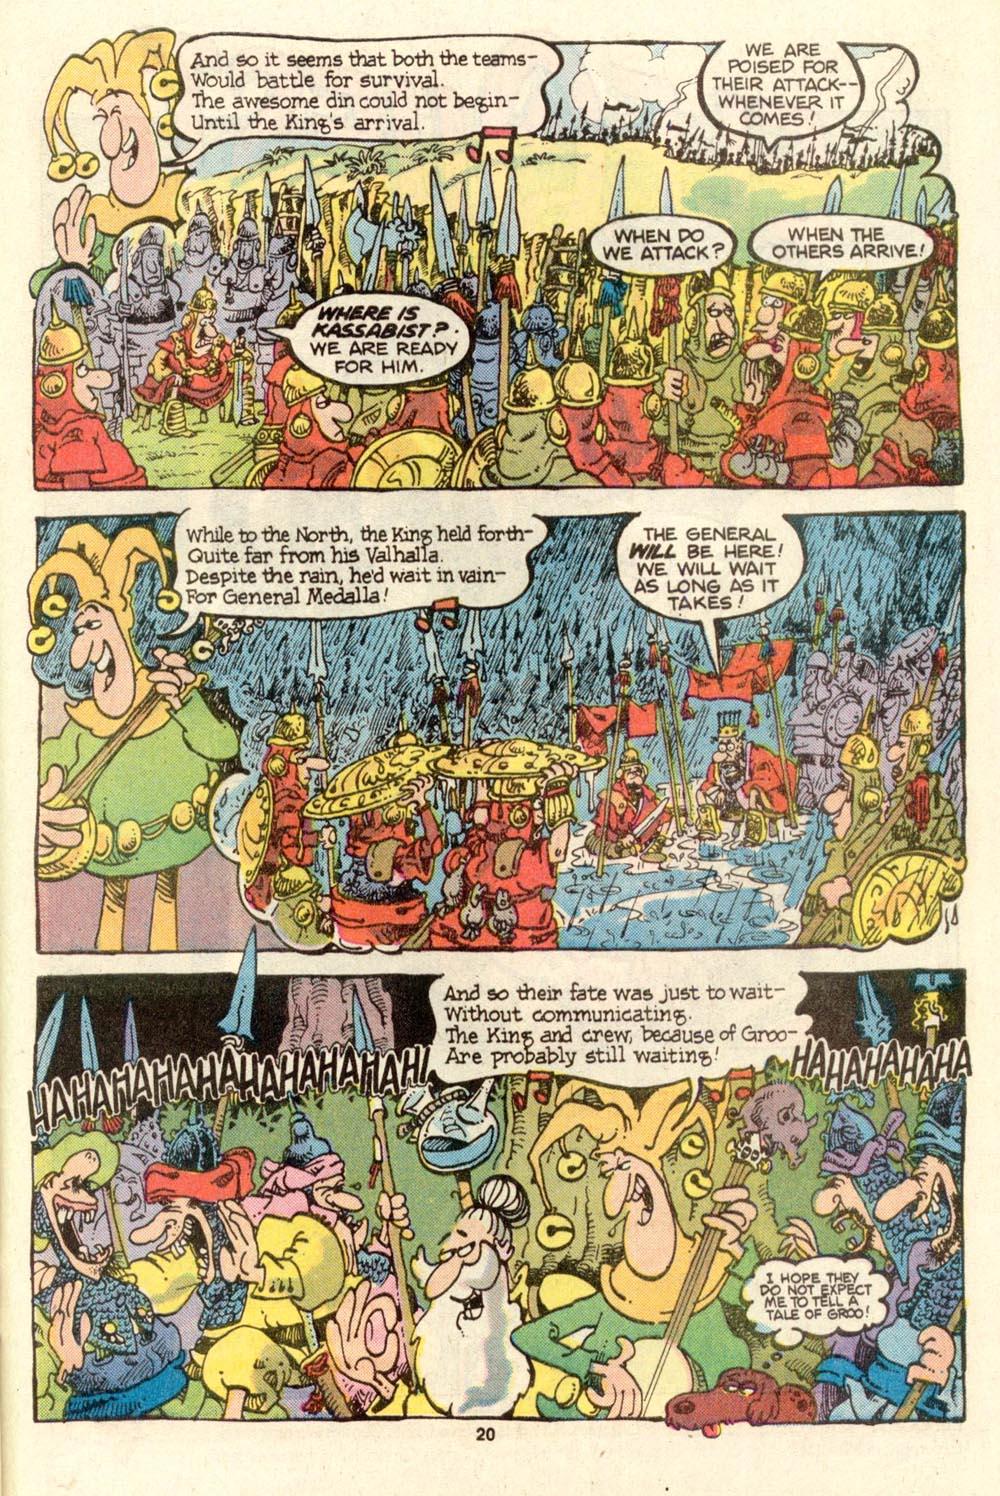 Read online Sergio Aragonés Groo the Wanderer comic -  Issue #27 - 20